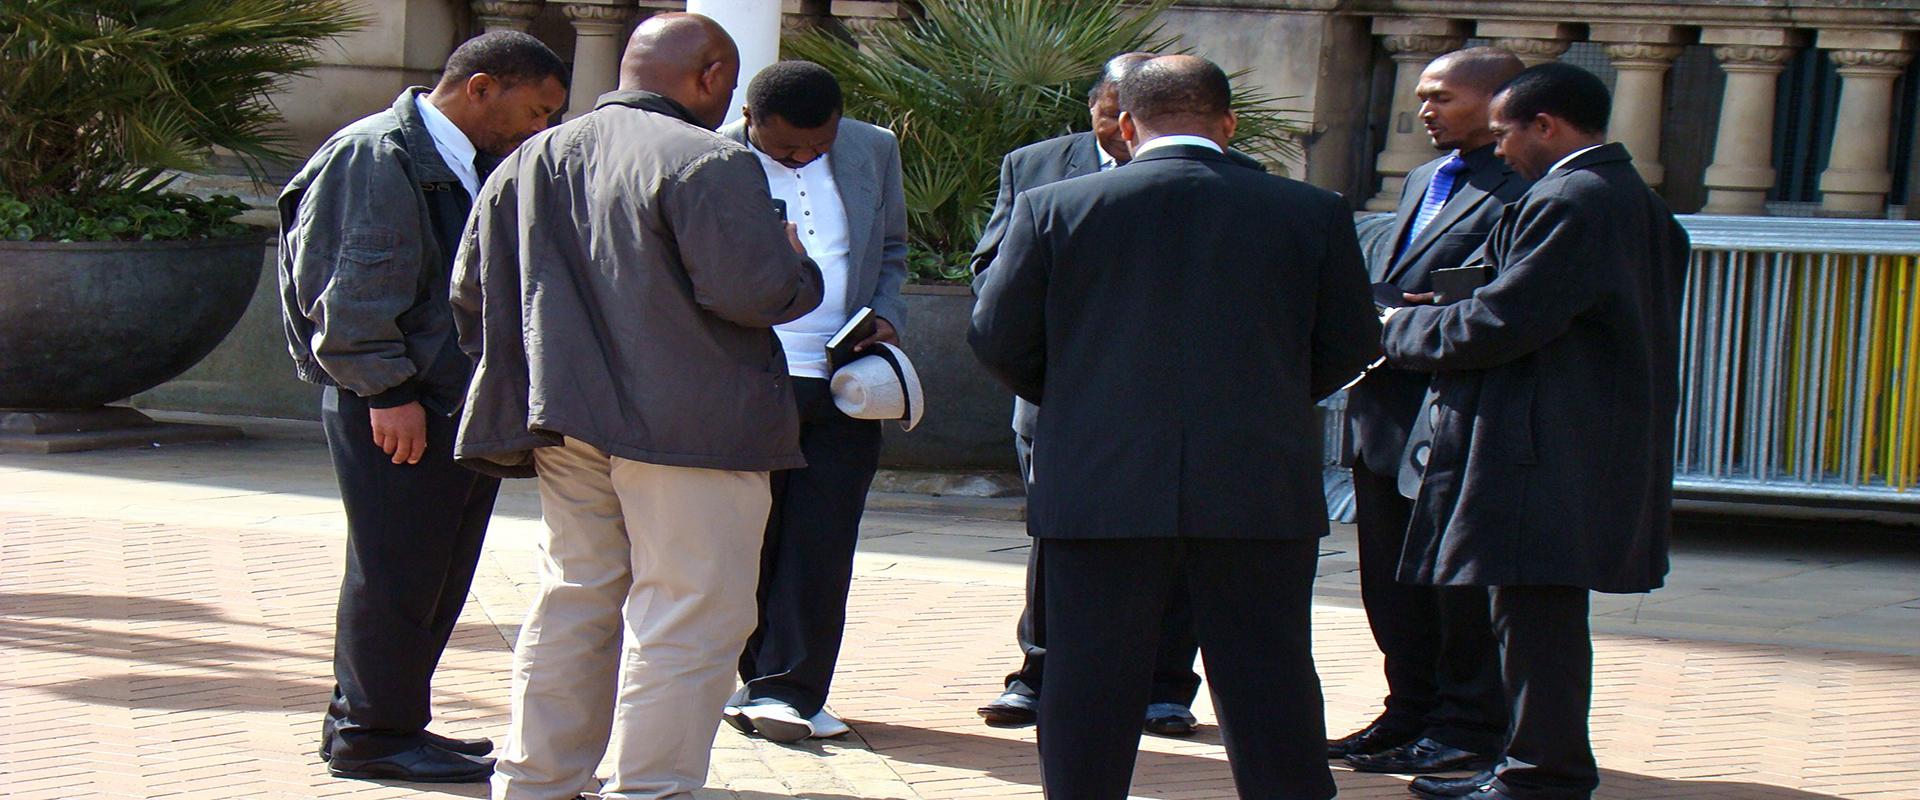 Mission Purse Prayer Network